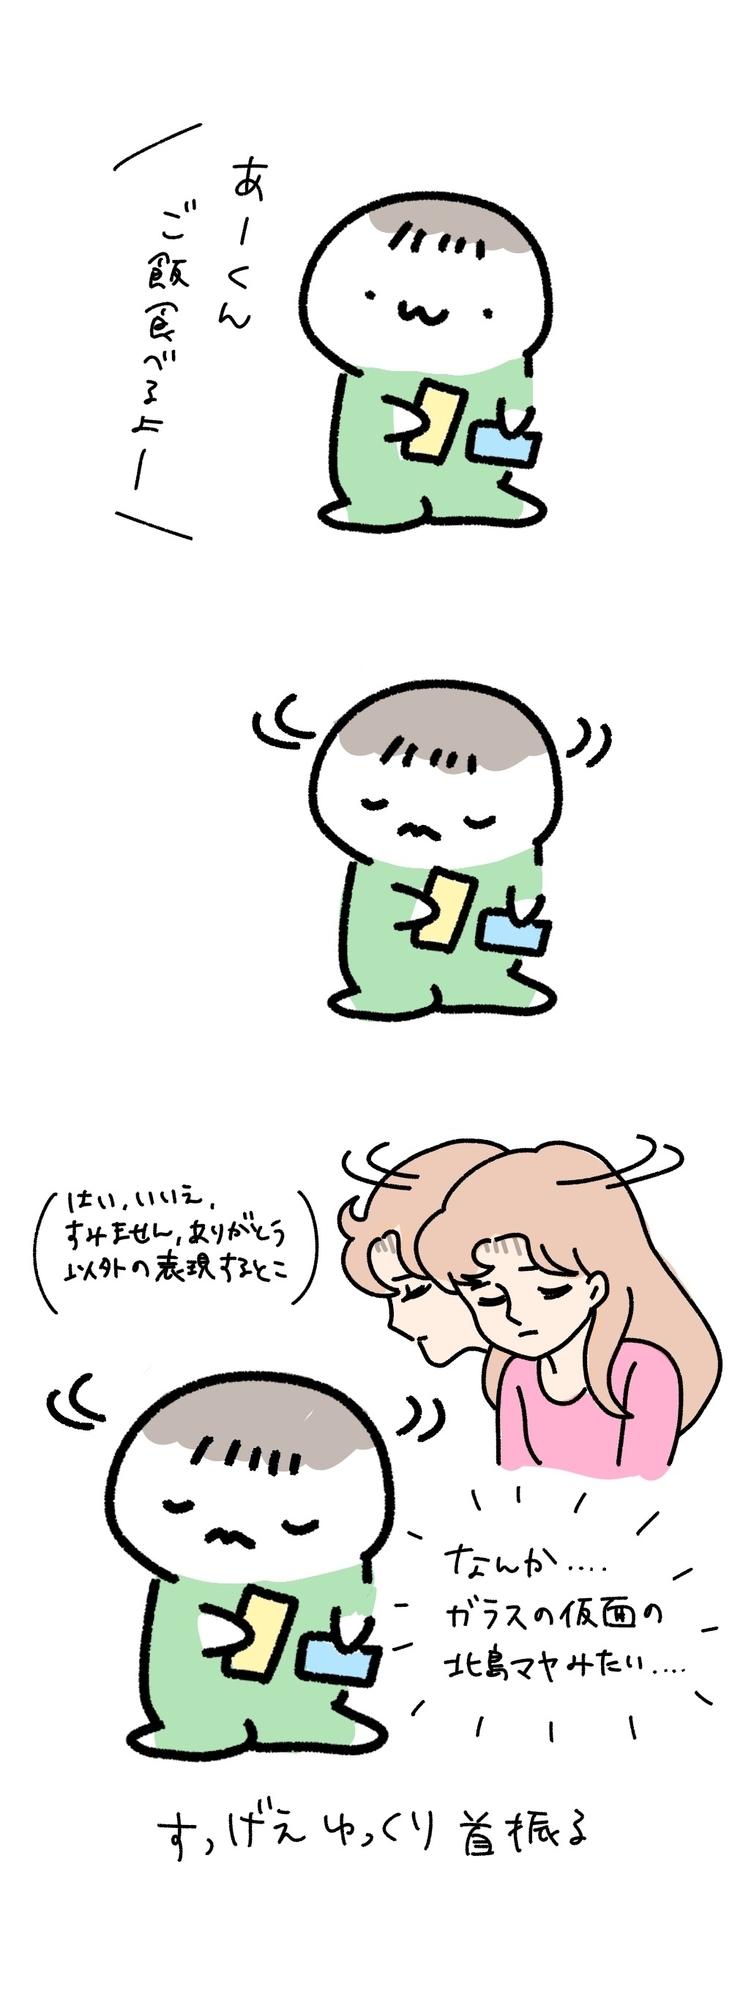 f:id:kinokino-mixtwins:20190506073736j:image